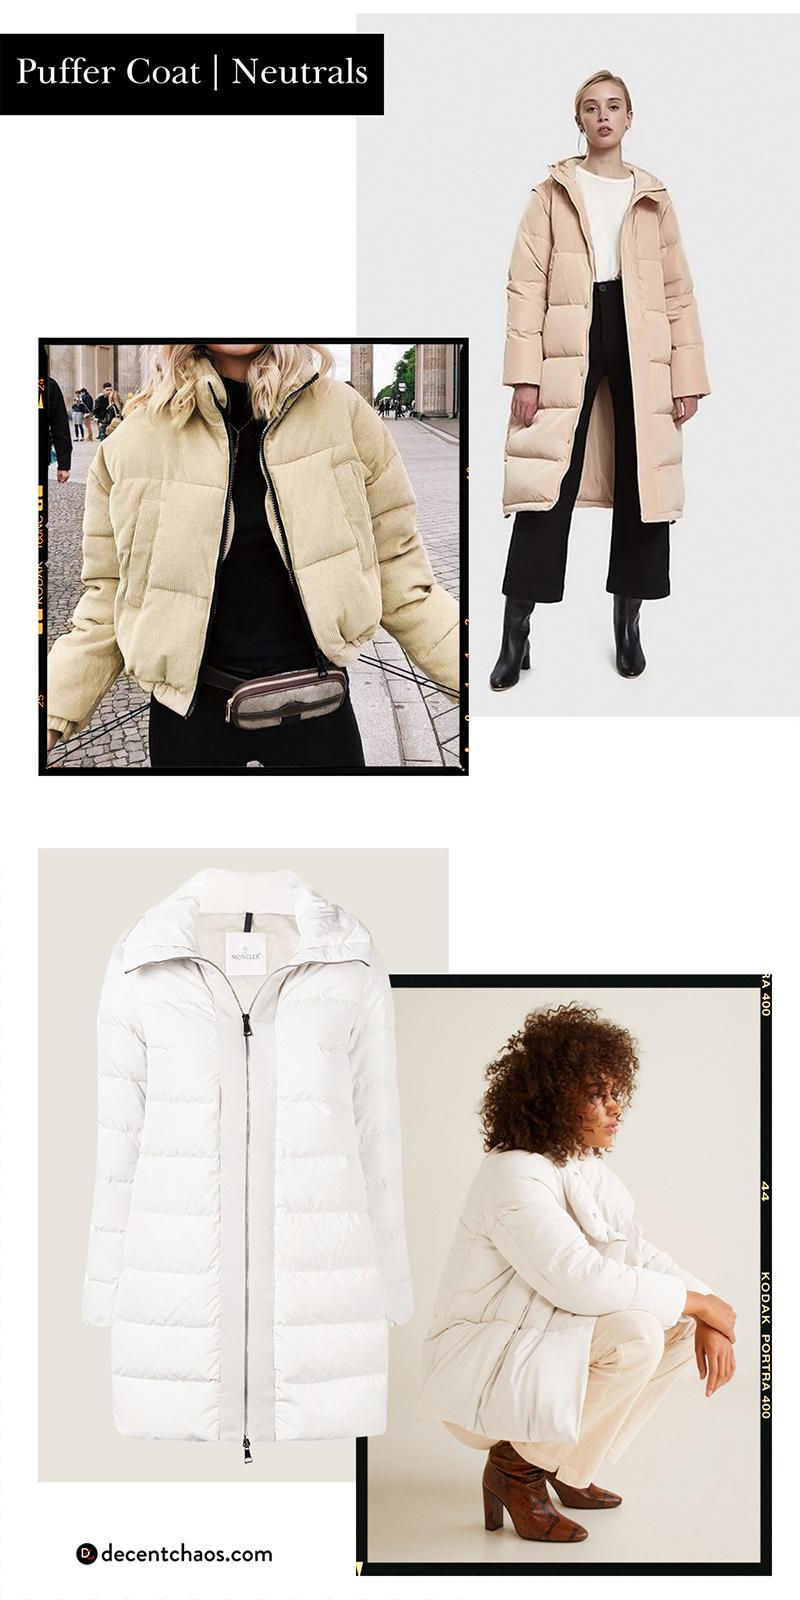 puffer-coat-neutrals.jpg